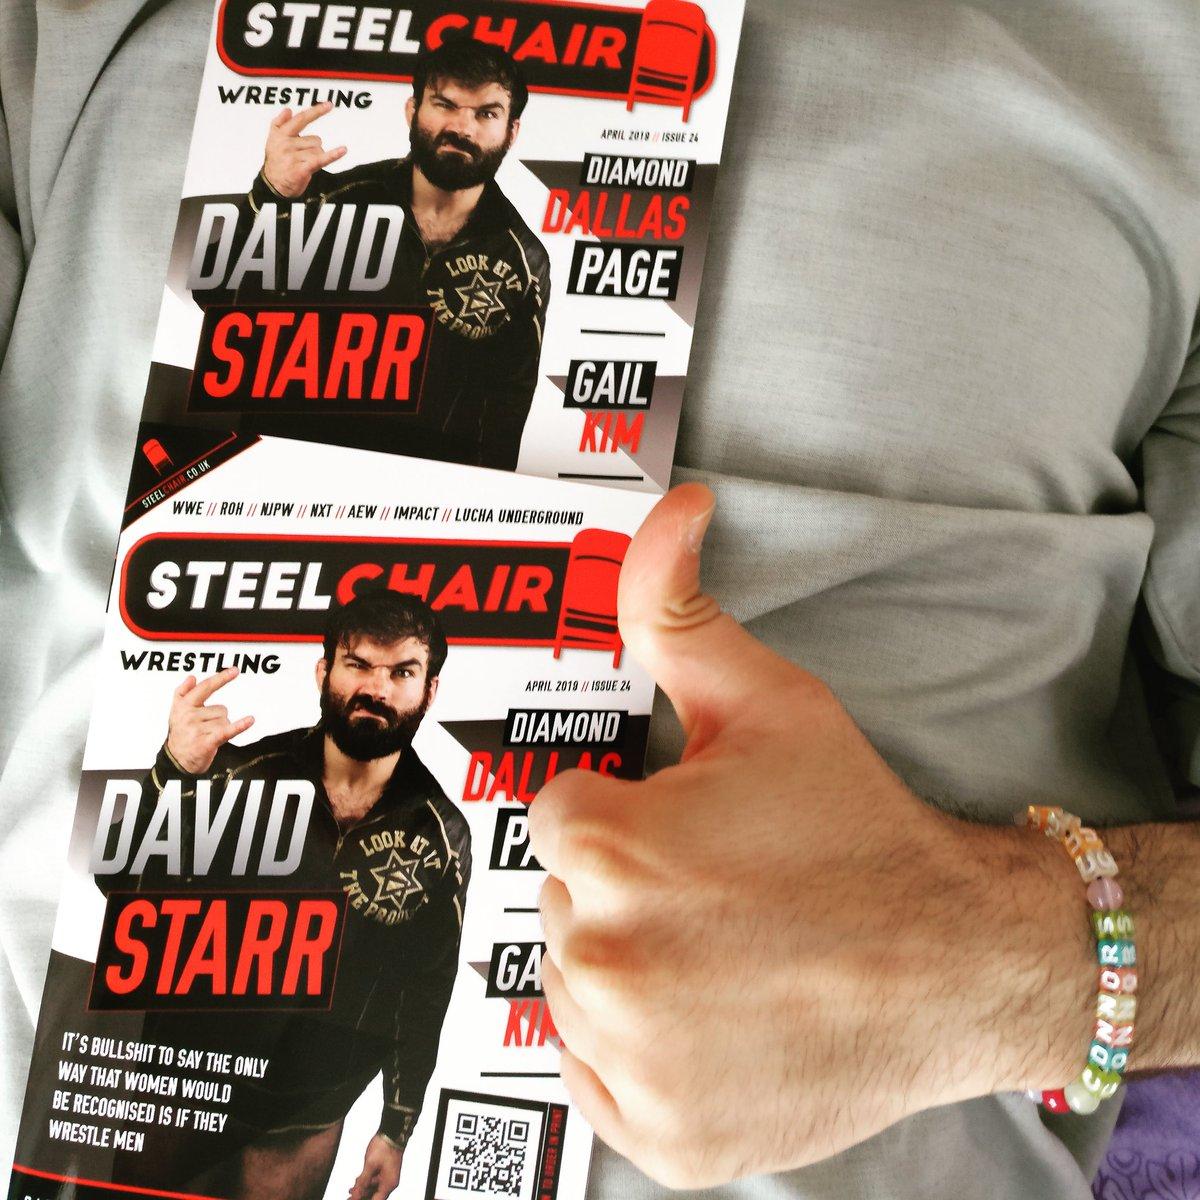 SteelChairMag photo